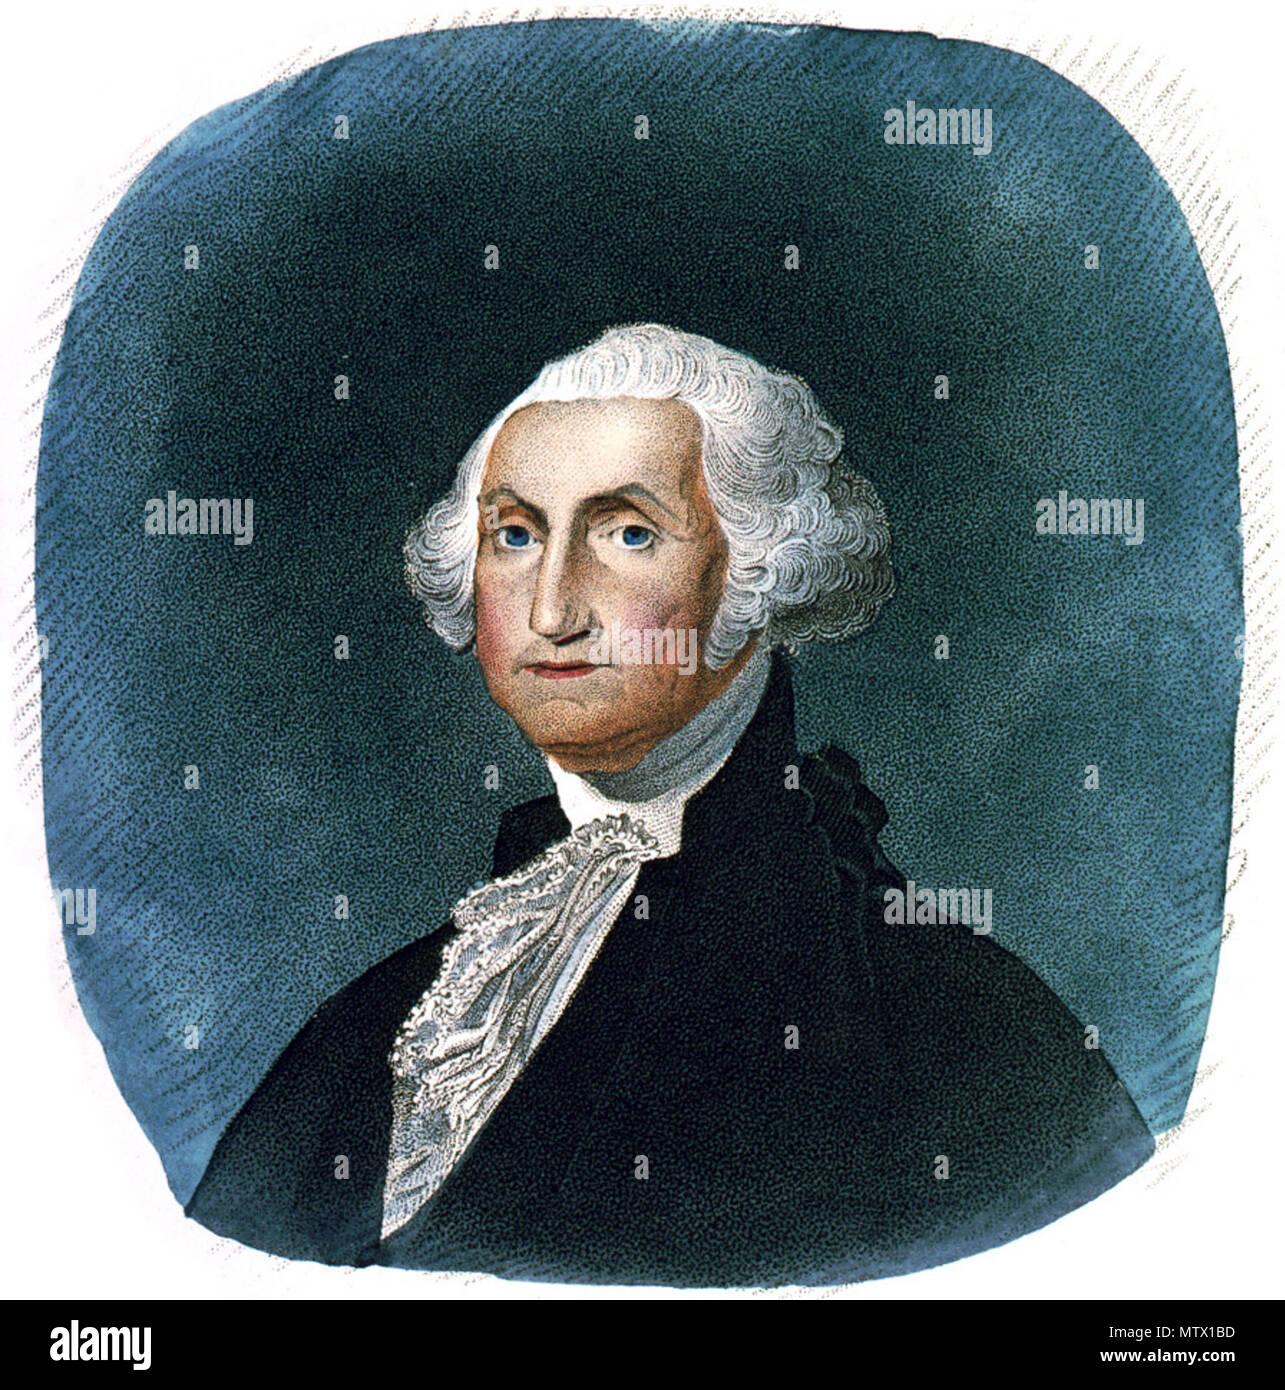 George Washington, head-and-shoulders portrait, facing left. 1 print ...